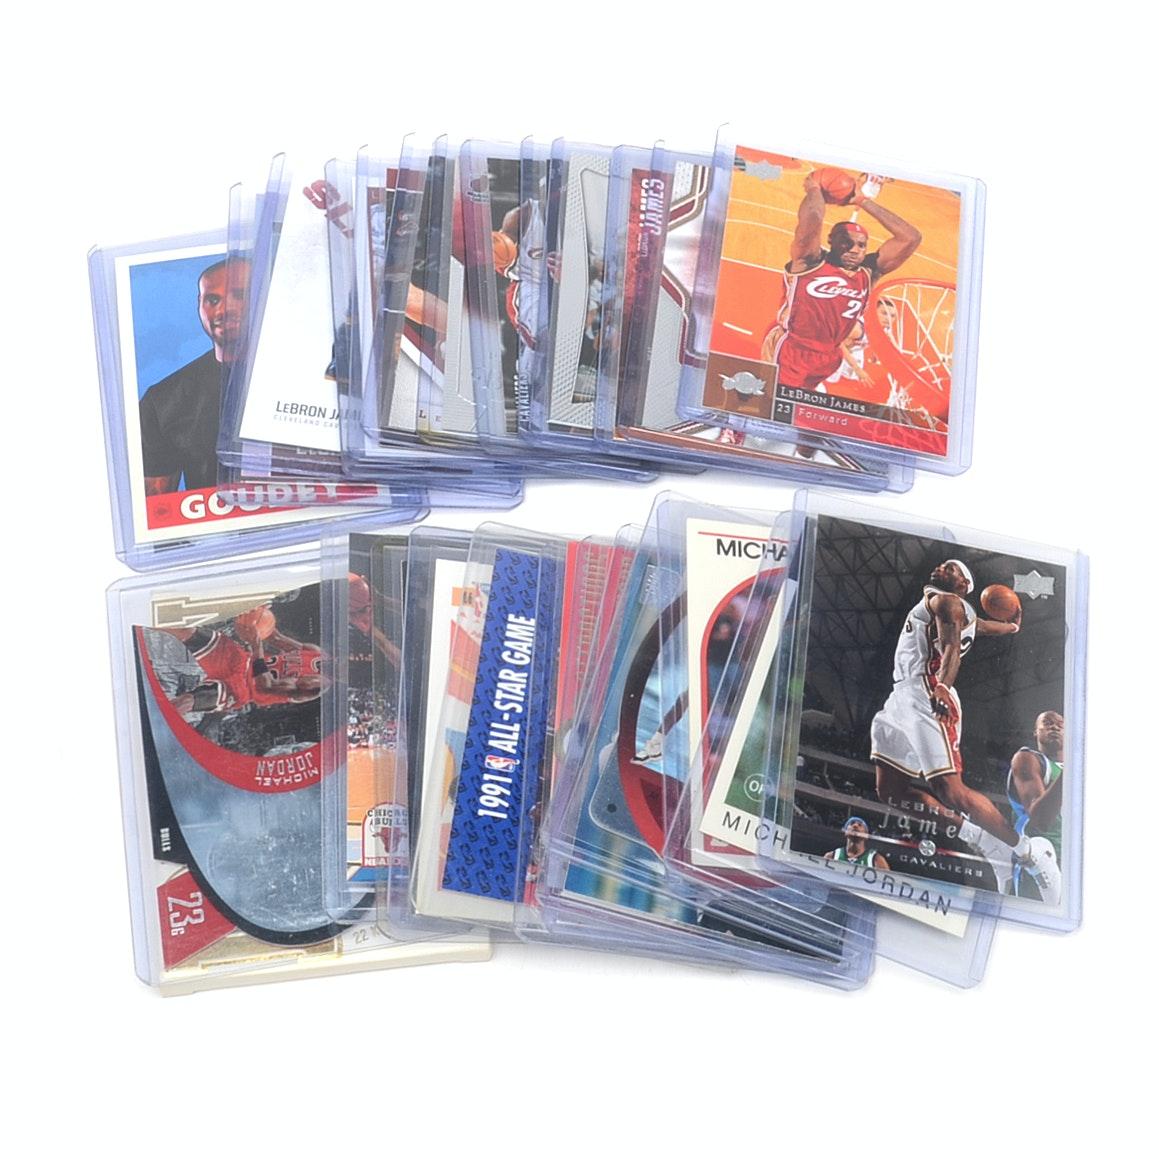 Jordan and James Basketball/Baseball Cards